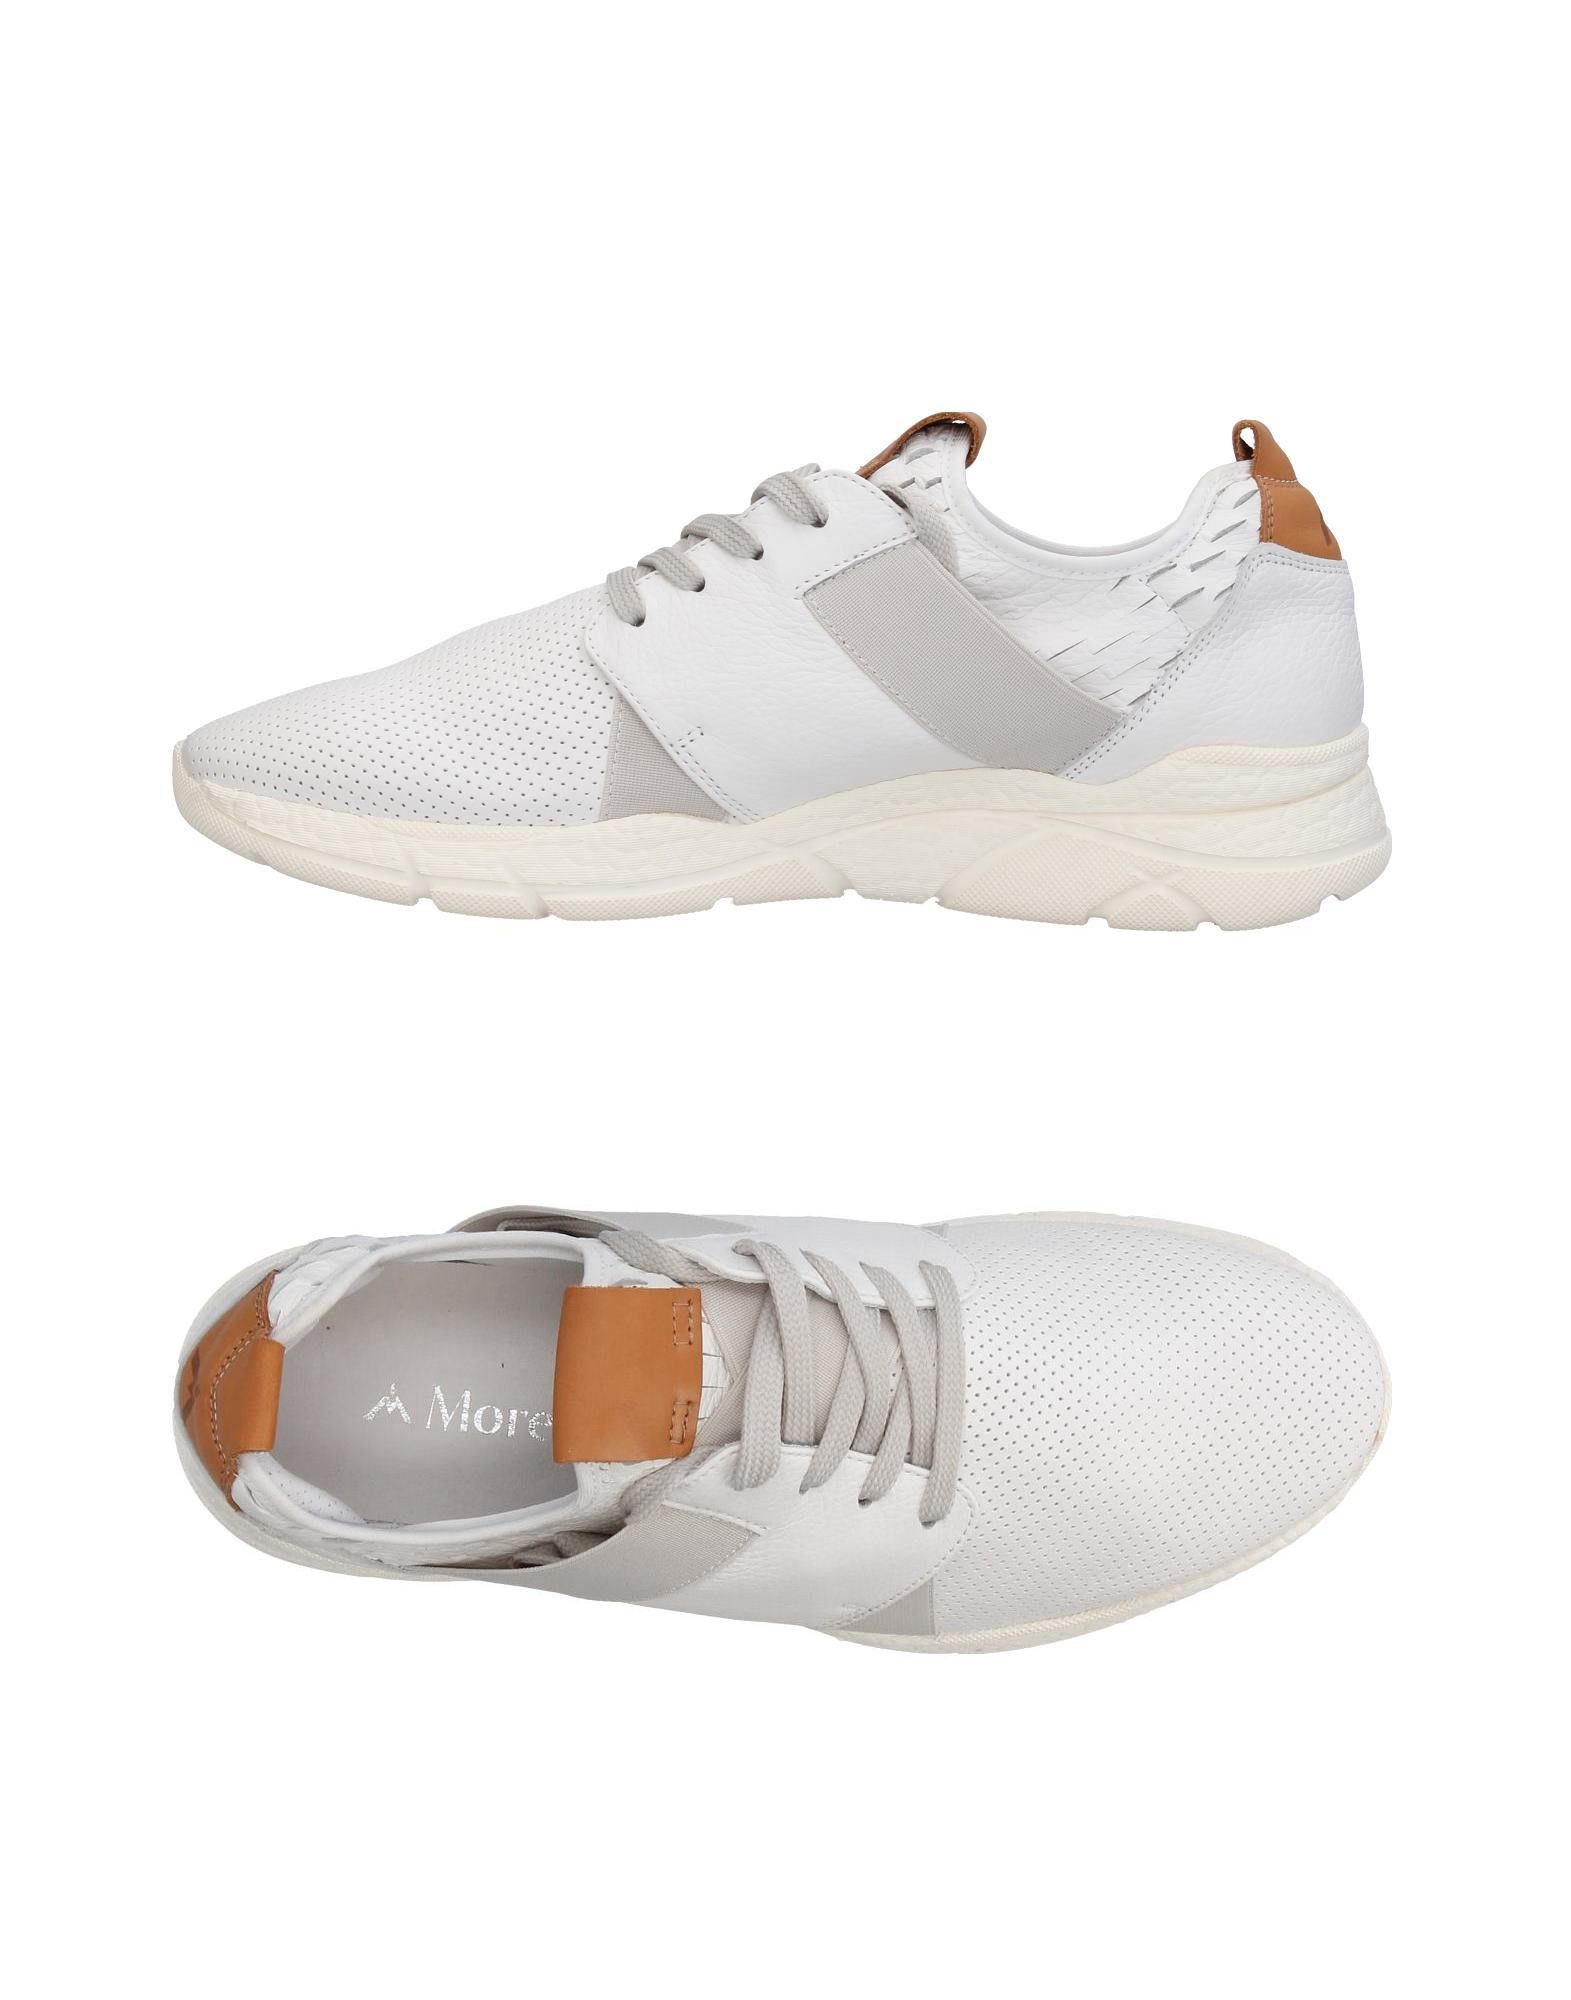 Morelli Andrea Morelli  Sneakers Herren  11388012GI 7d7151